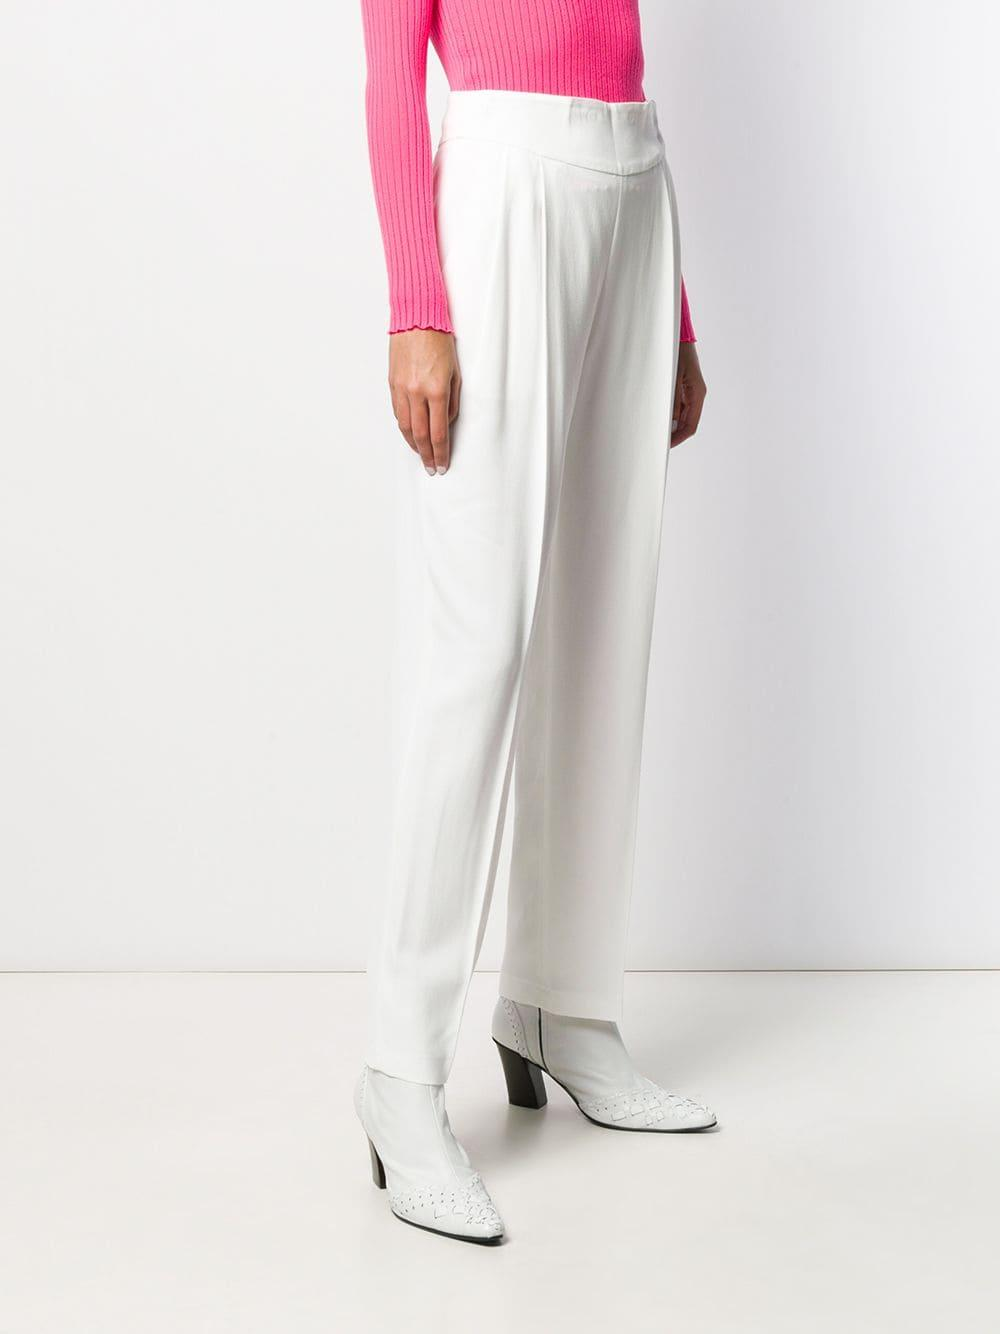 Pantalones de vestir de talle alto MSGM de Tejido sintético de color Blanco